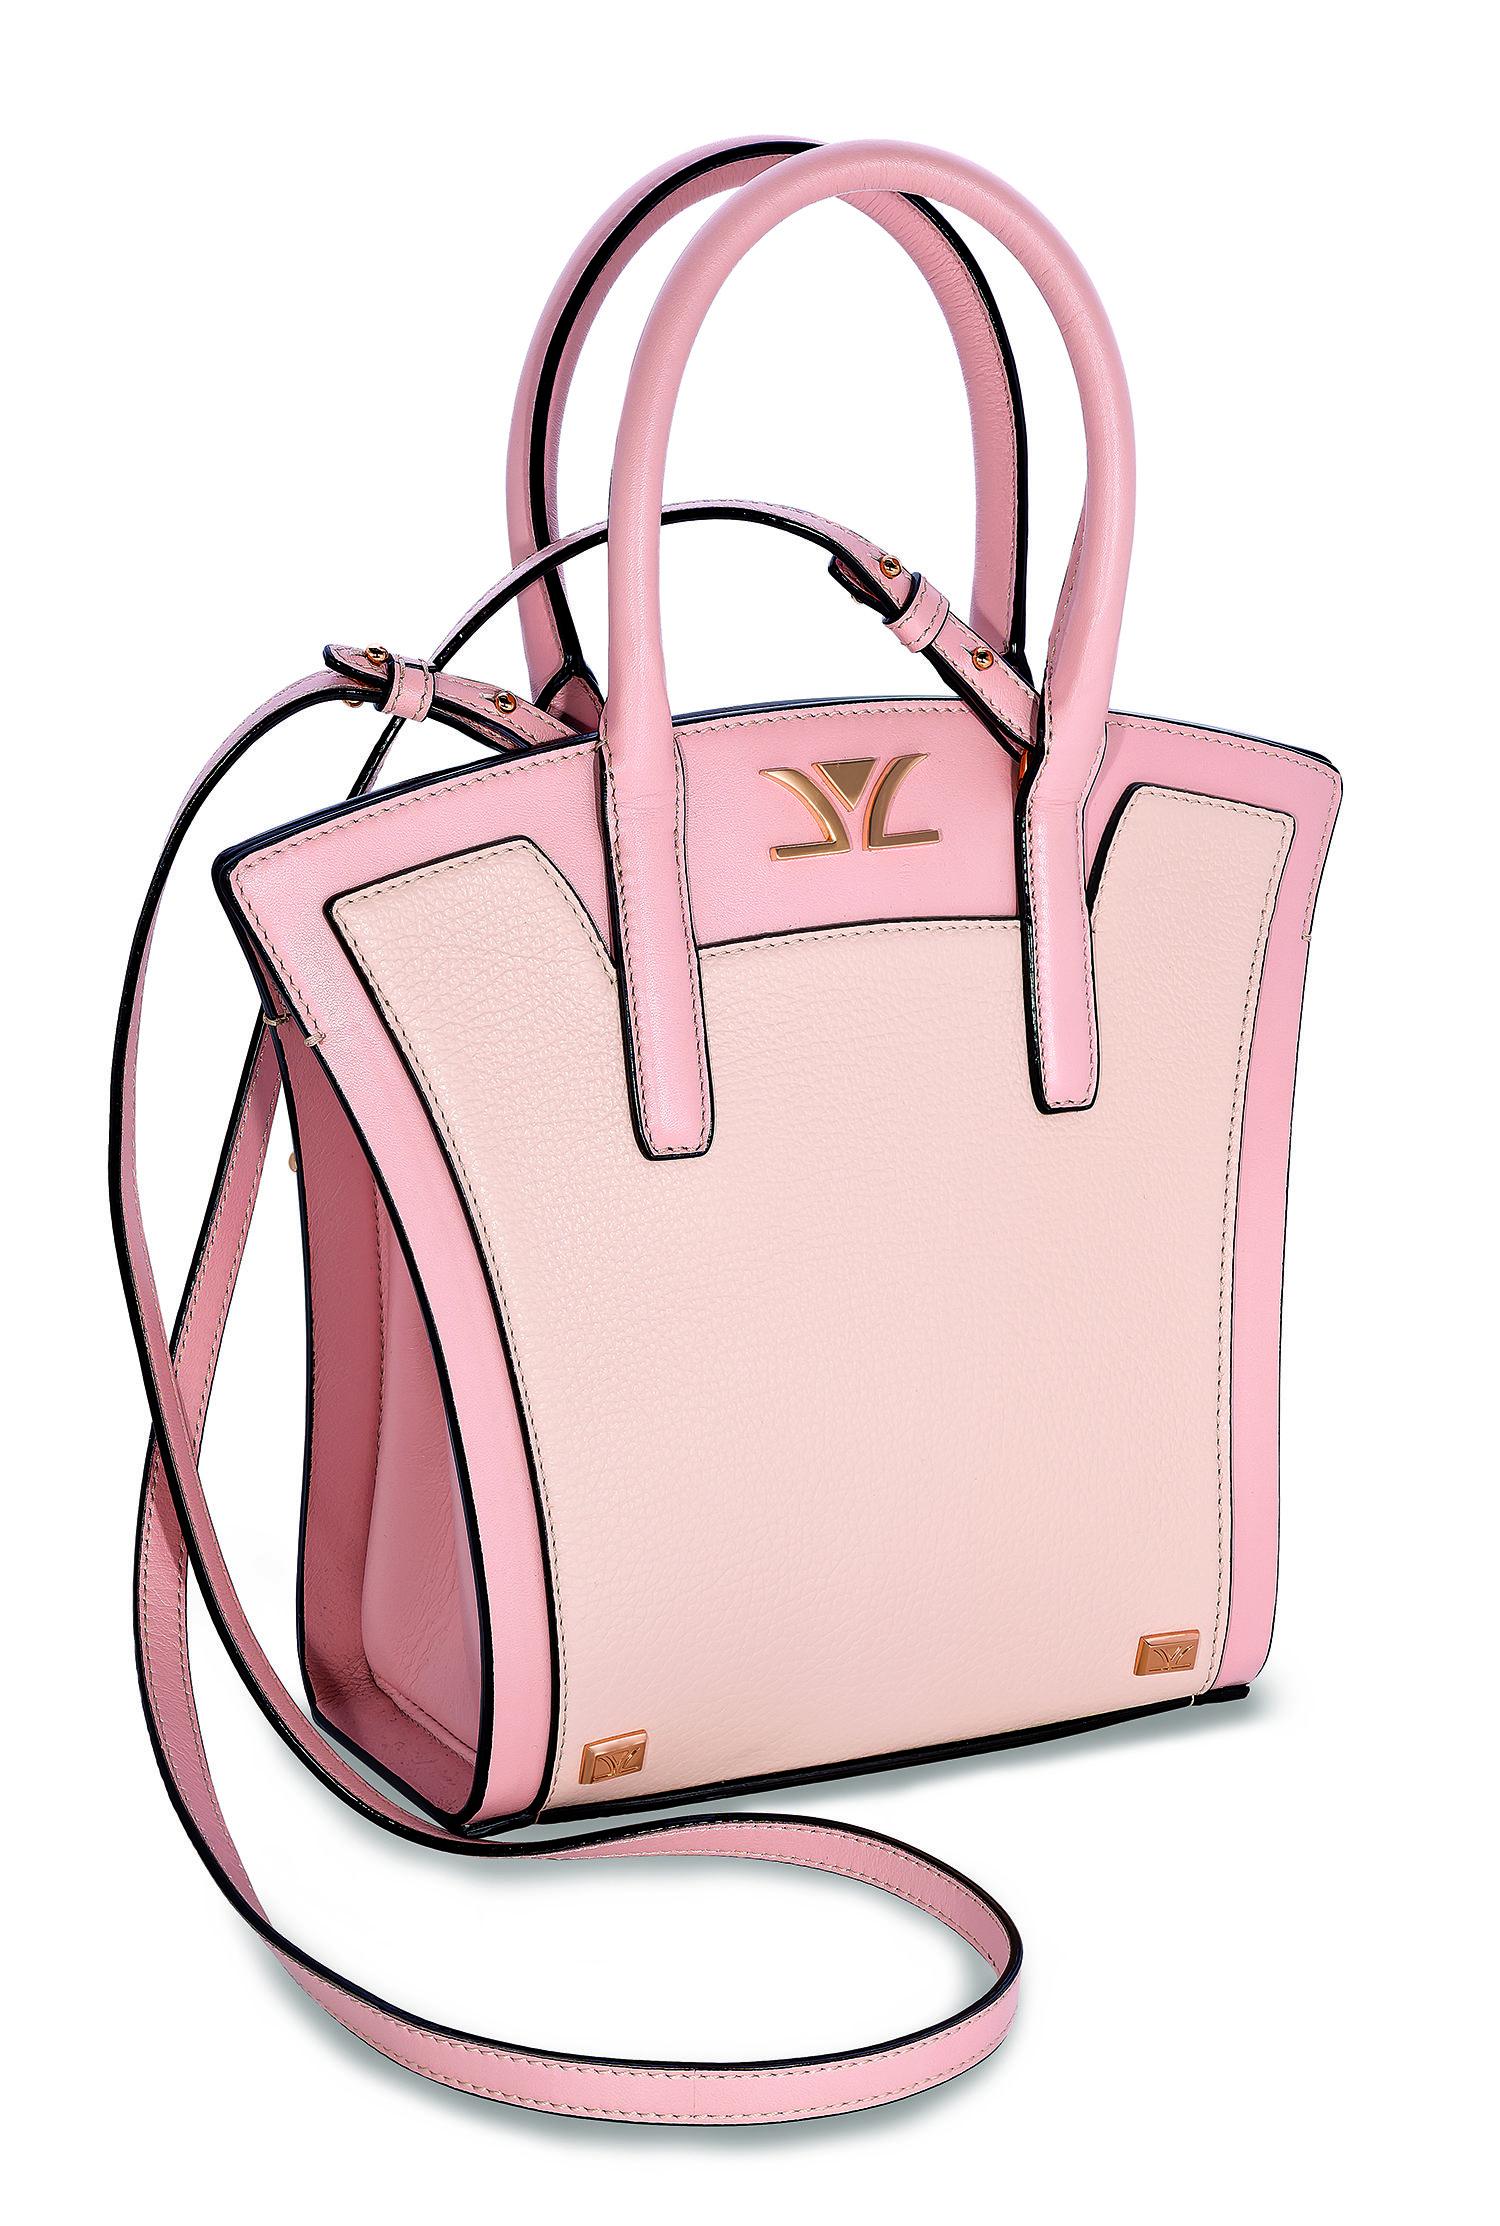 126d6dcd6 NOW AVAILABLE ONLINE! Le Vian Luxury™ Peach & Nude™ Liz Mini Crossbody  Handbag in Italian Pebbled Leather